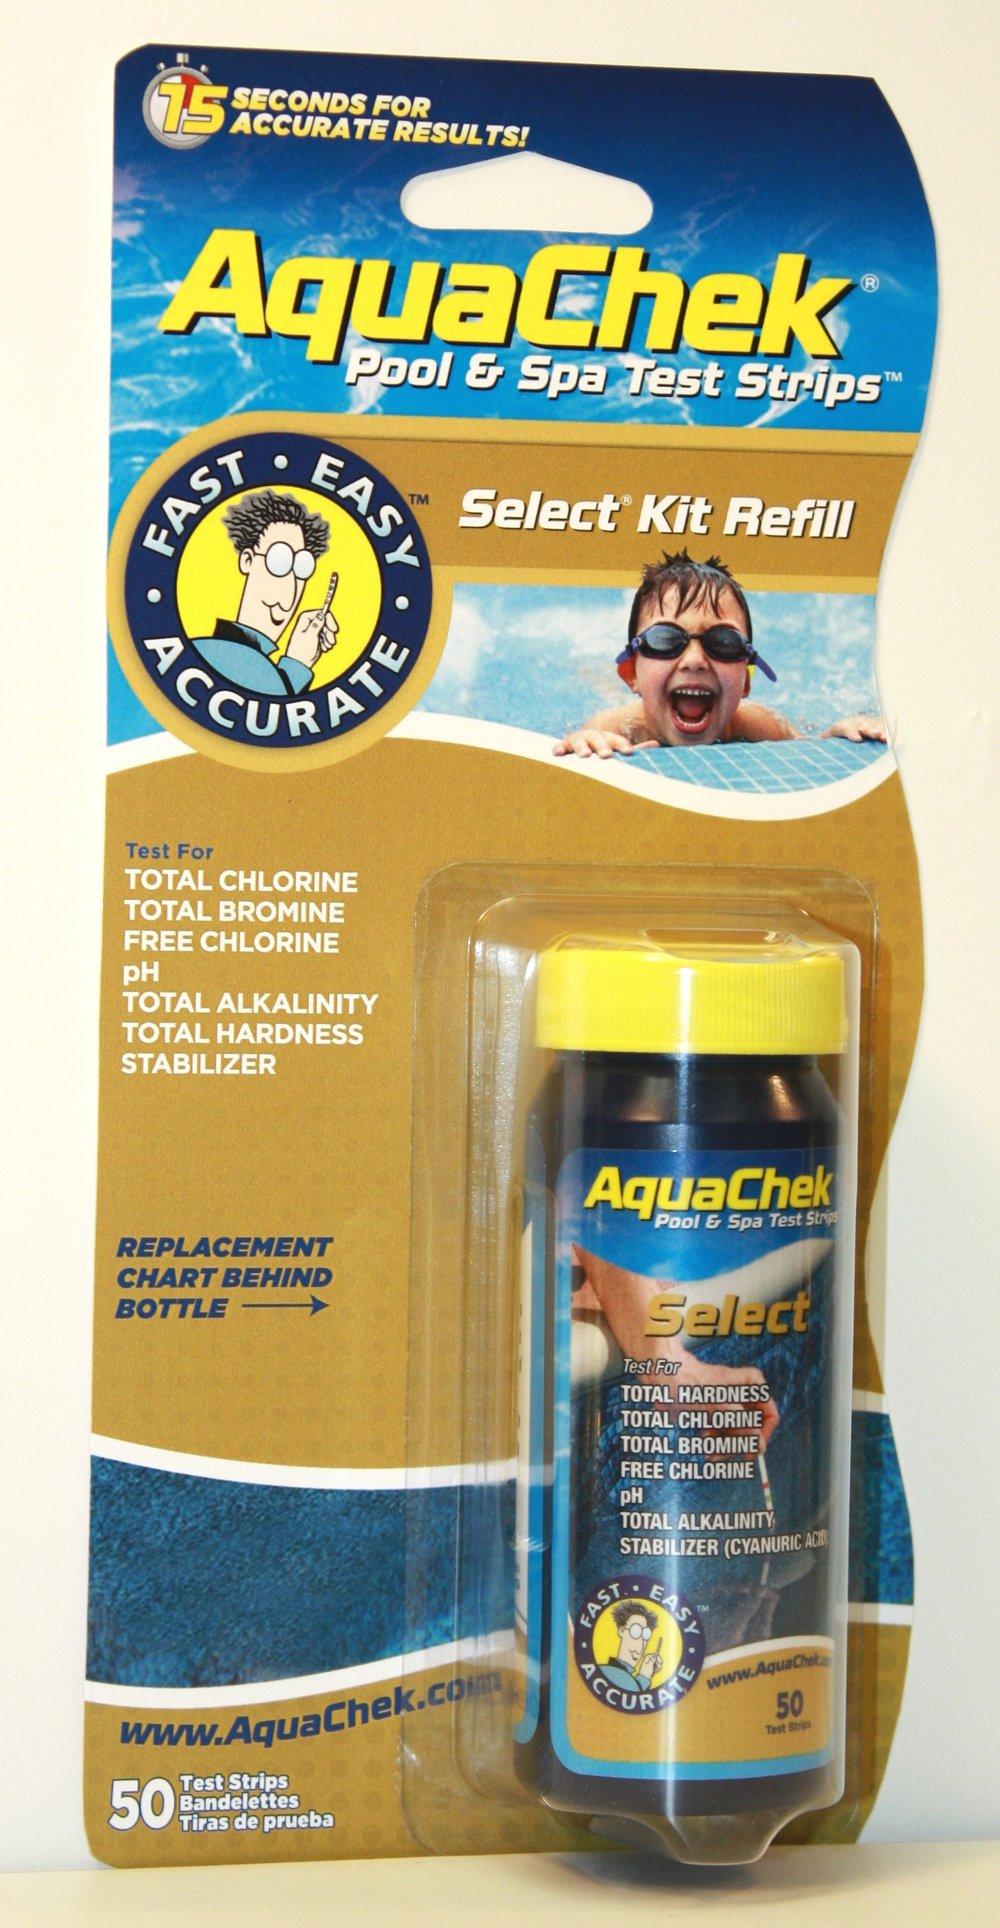 200) New AQUACHEK Select Refill Swimming Pool Spa 7 Test Strips pH/Chlorine by AquaChek